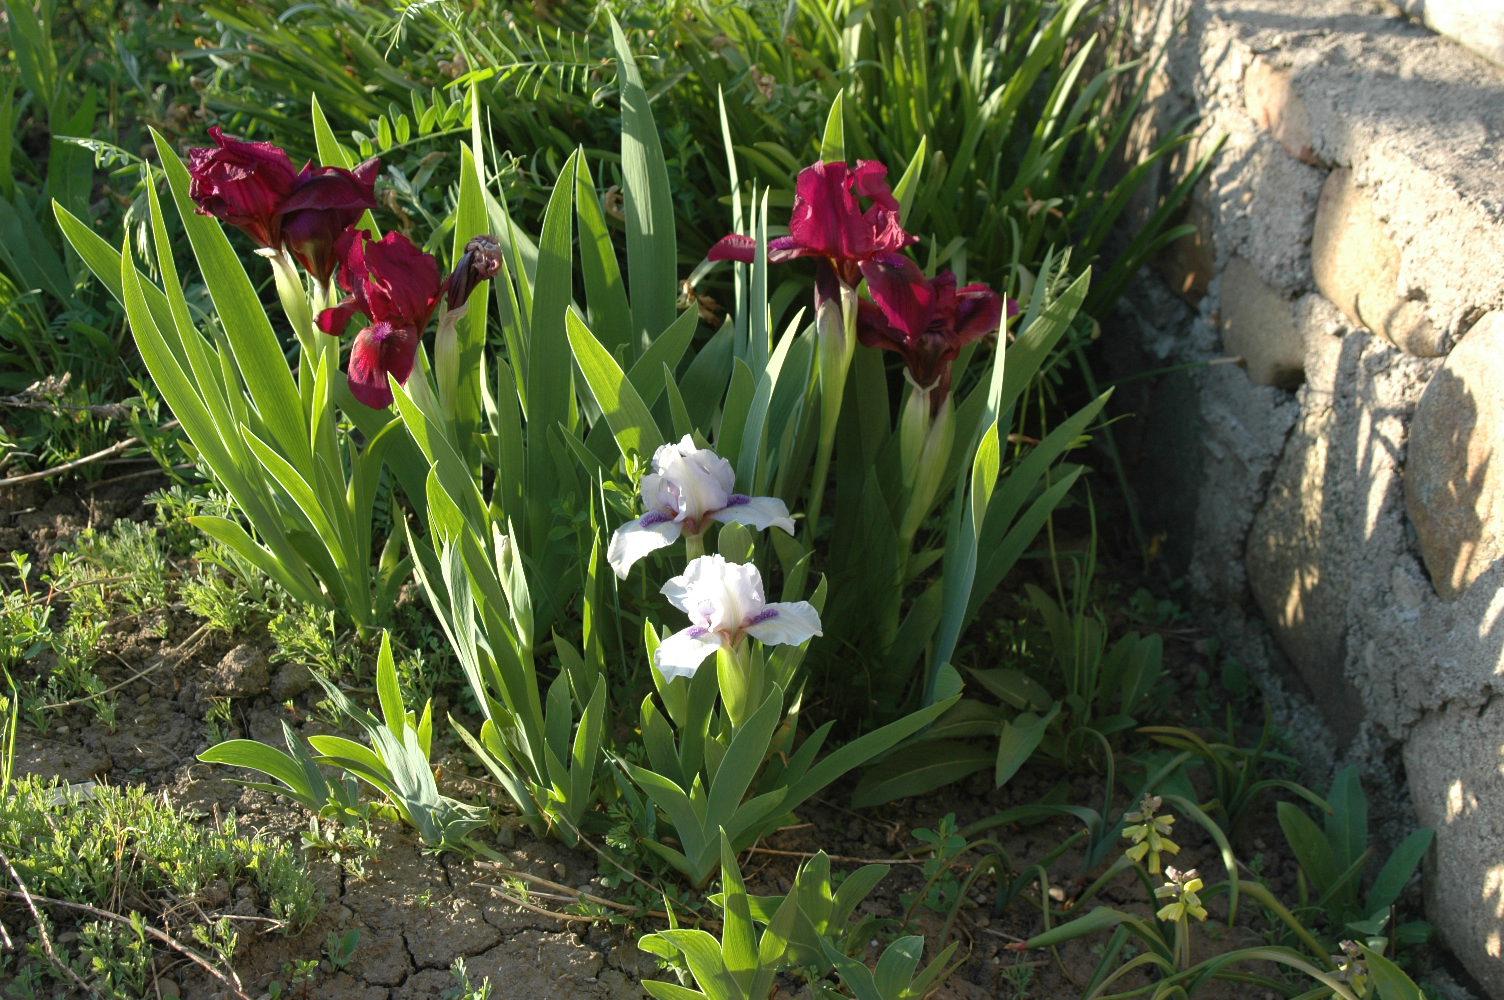 Roche Fleurie Garden Cherry Garden Portrait Of An Iris